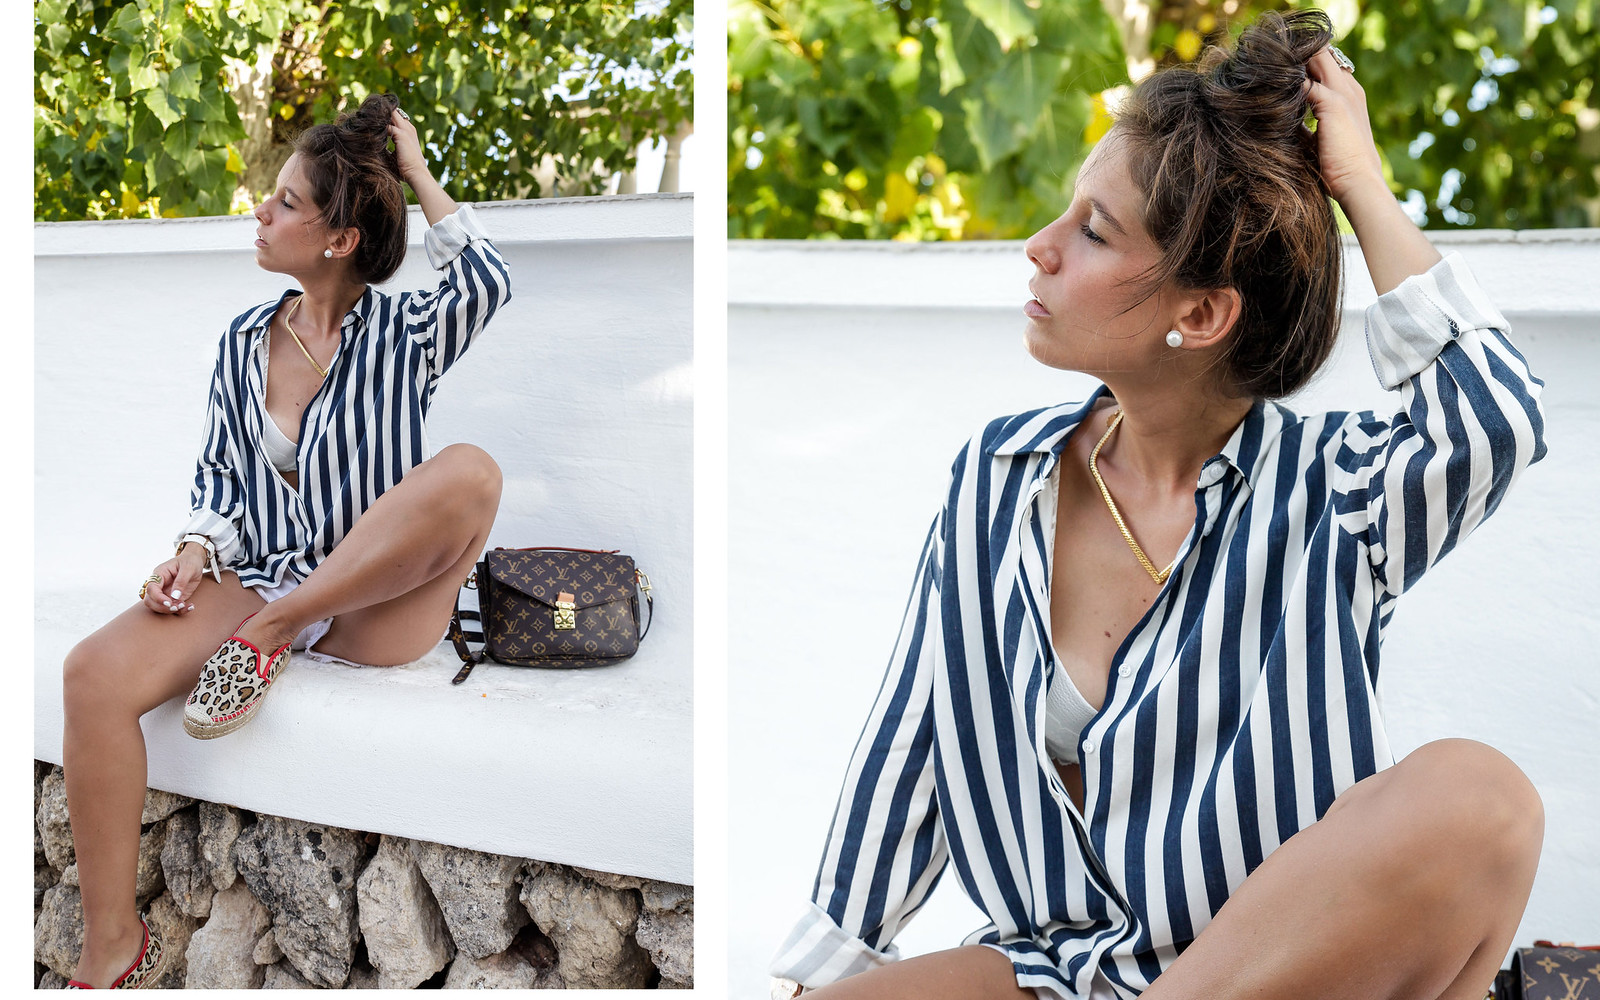 05_Leopard_and_stripes_perfec_mix_print_outfit_THEGUESTGIRL_menorca_look